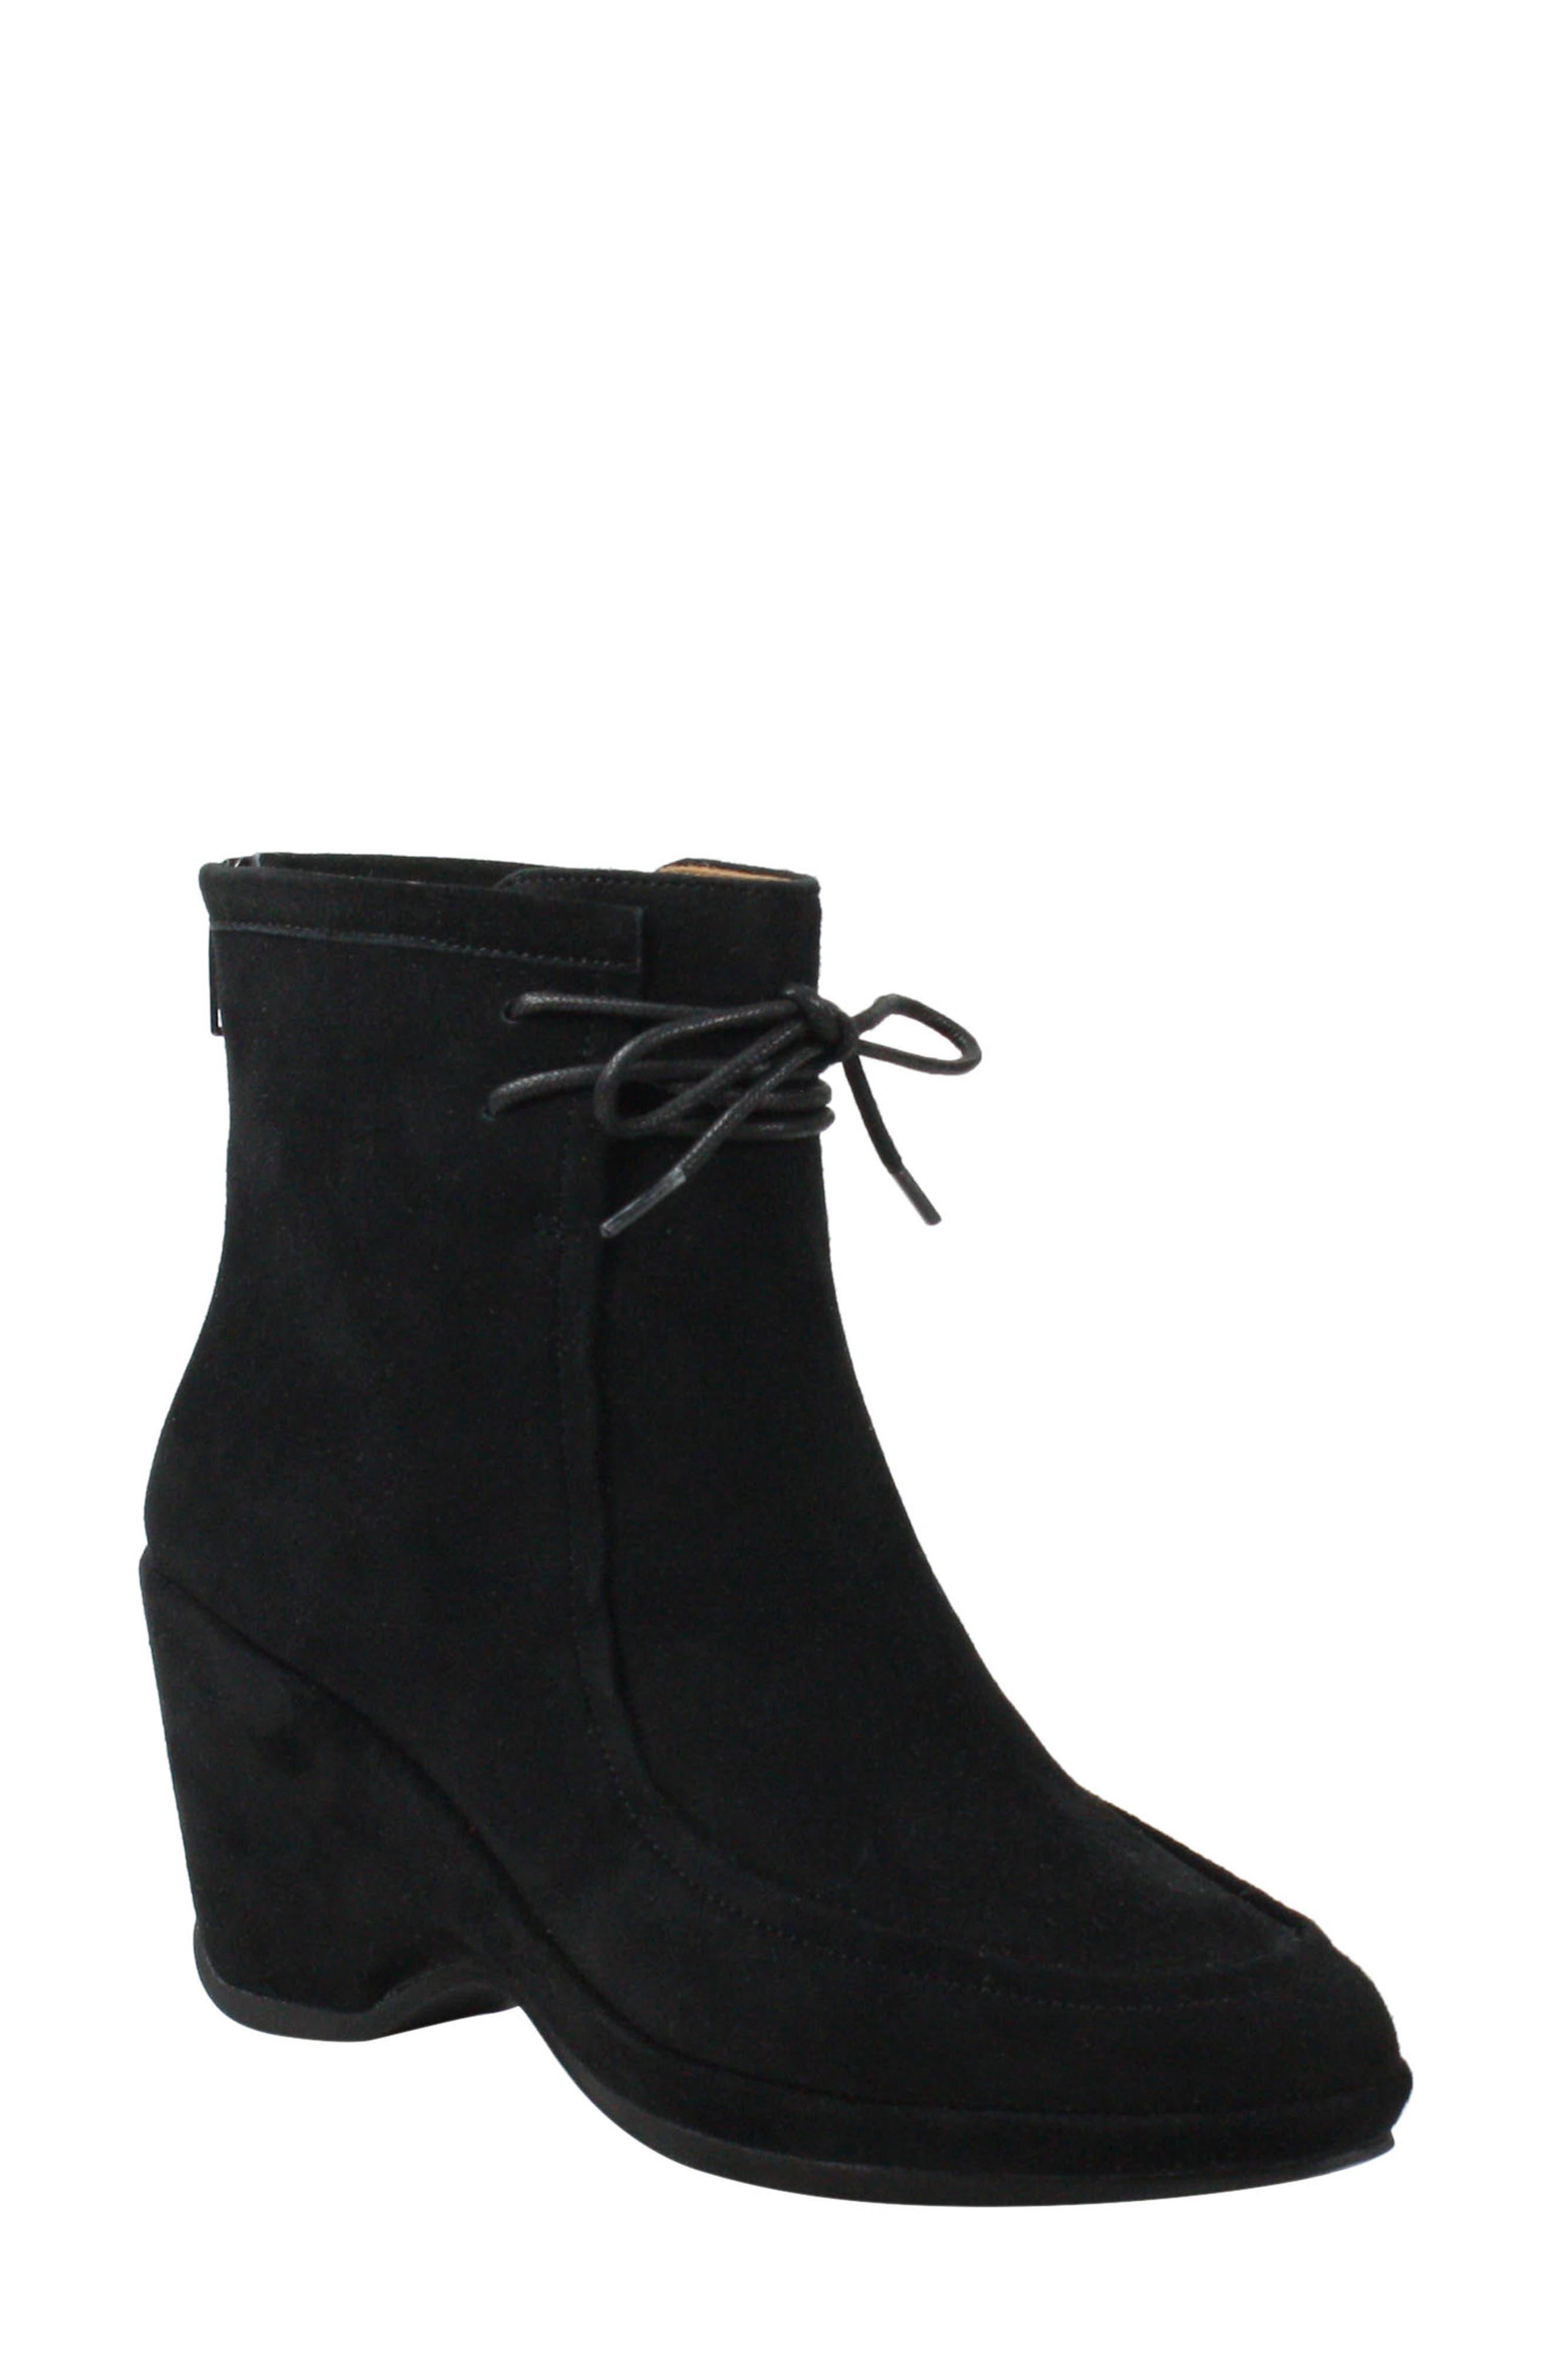 1950s Style Shoes | Heels, Flats, Saddle Shoes Womens LAmour Des Pieds Olesia Boot $129.89 AT vintagedancer.com